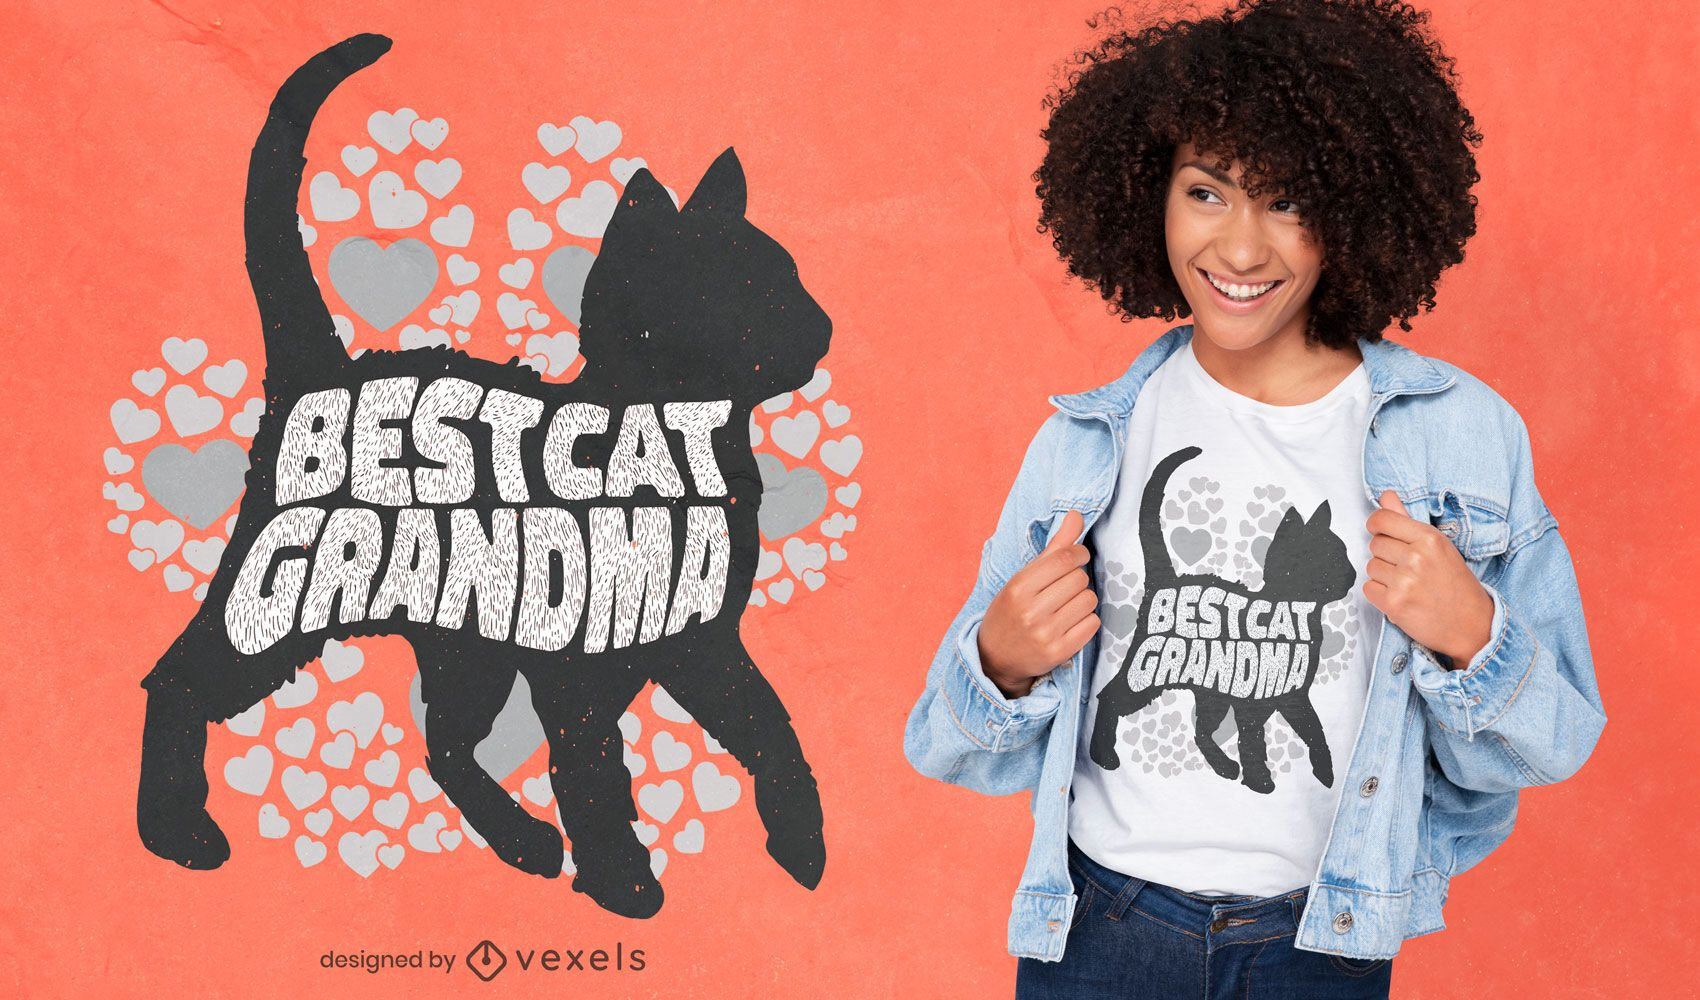 Best cat grandma t-shirt design